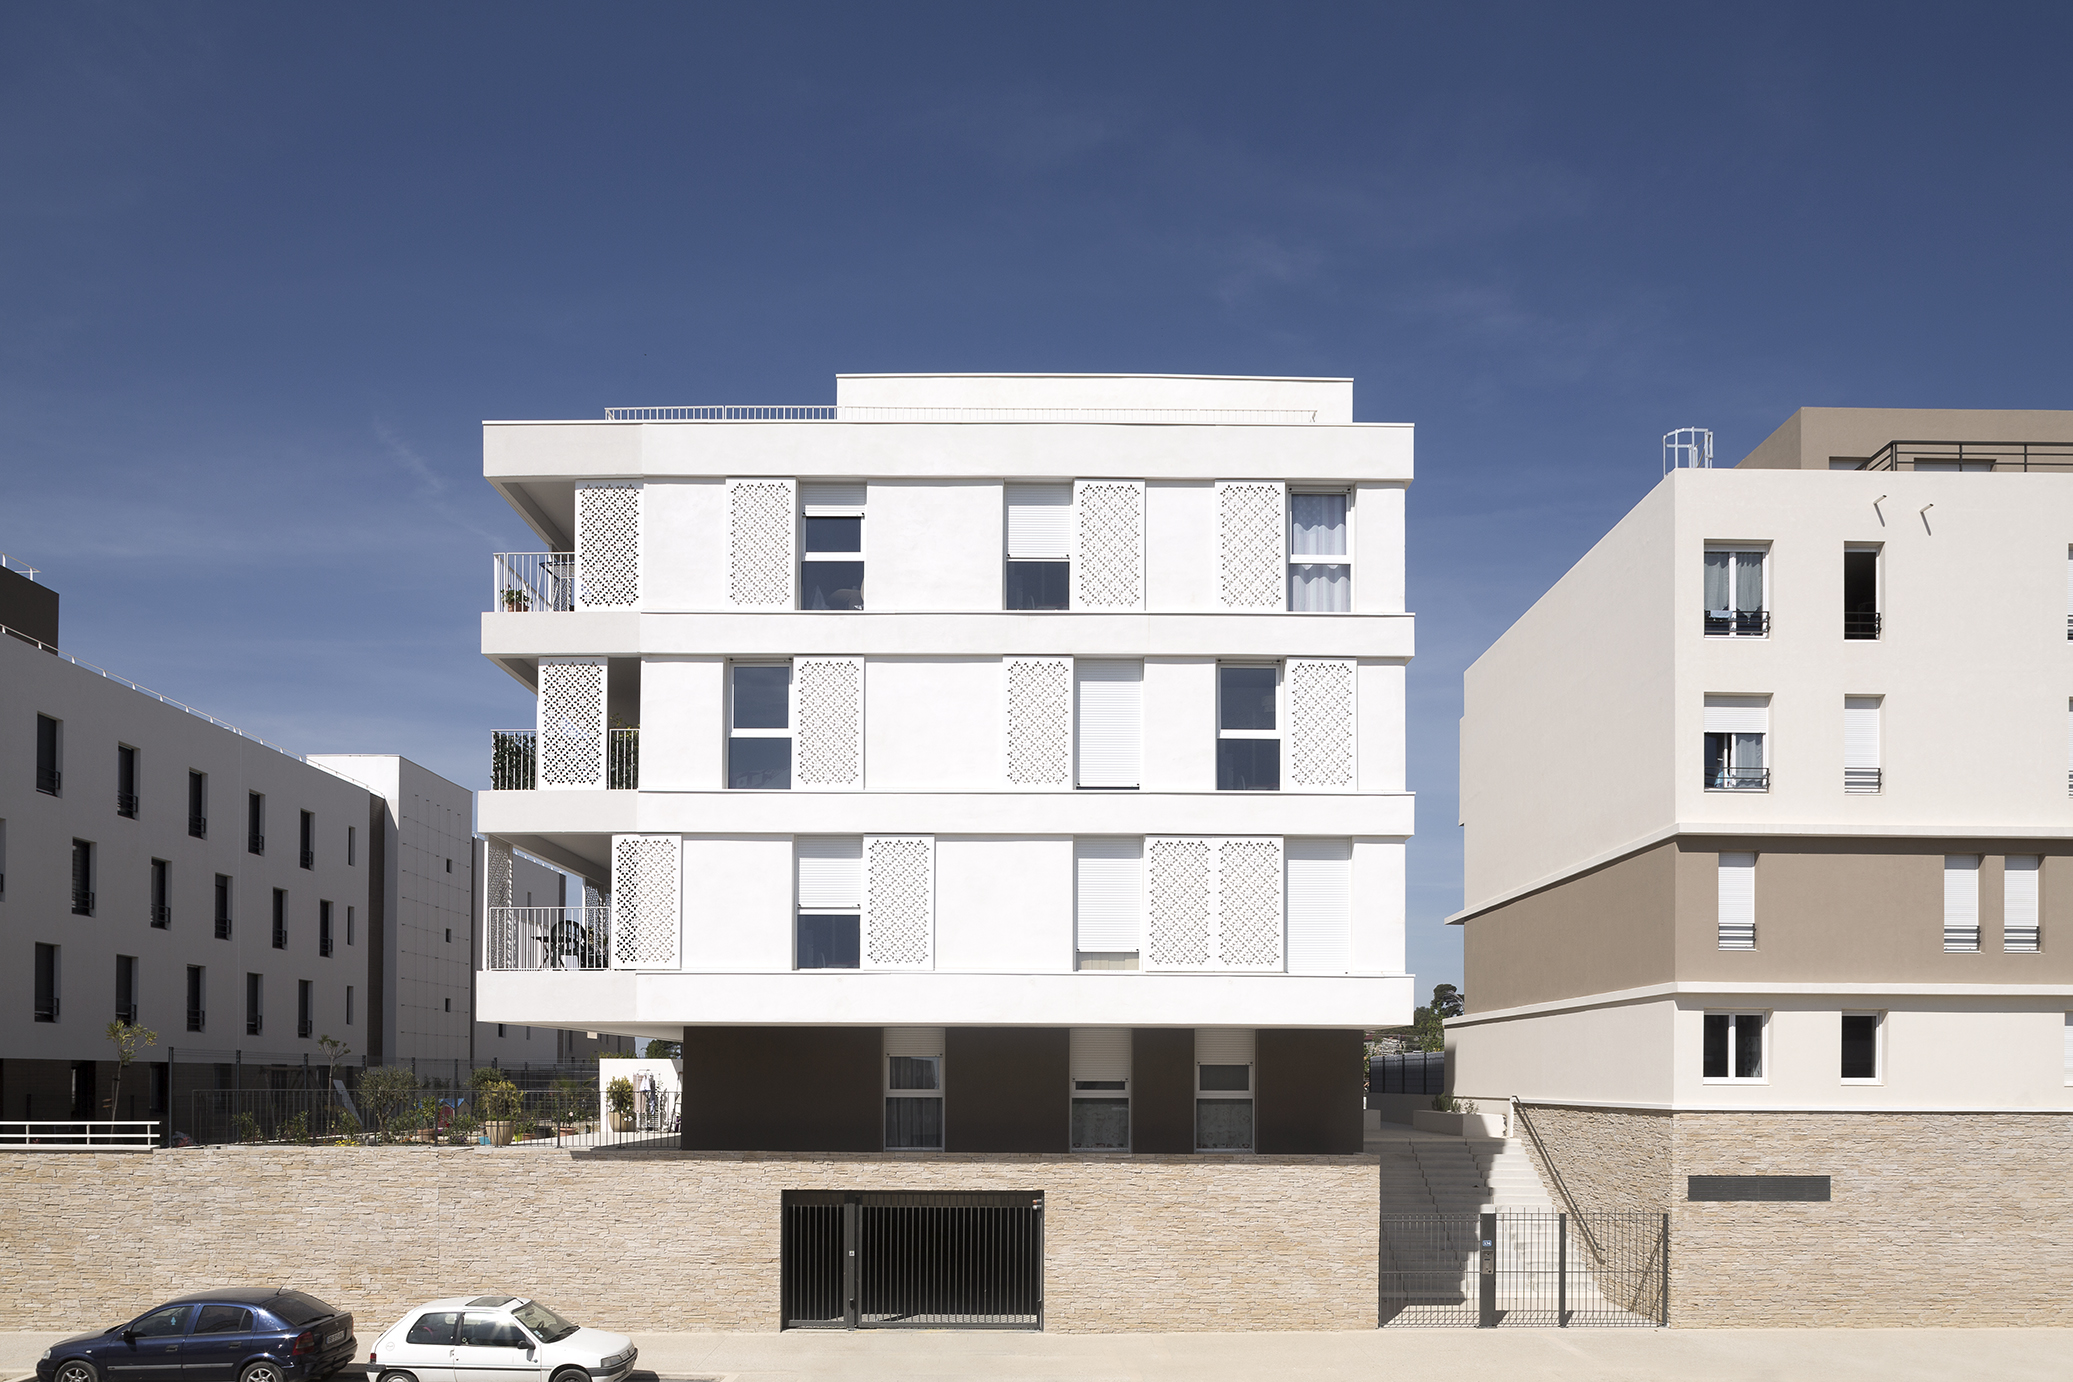 Yellow Architecture Céline Martin Alyzéa Grisettes Montpellier Avril 2015